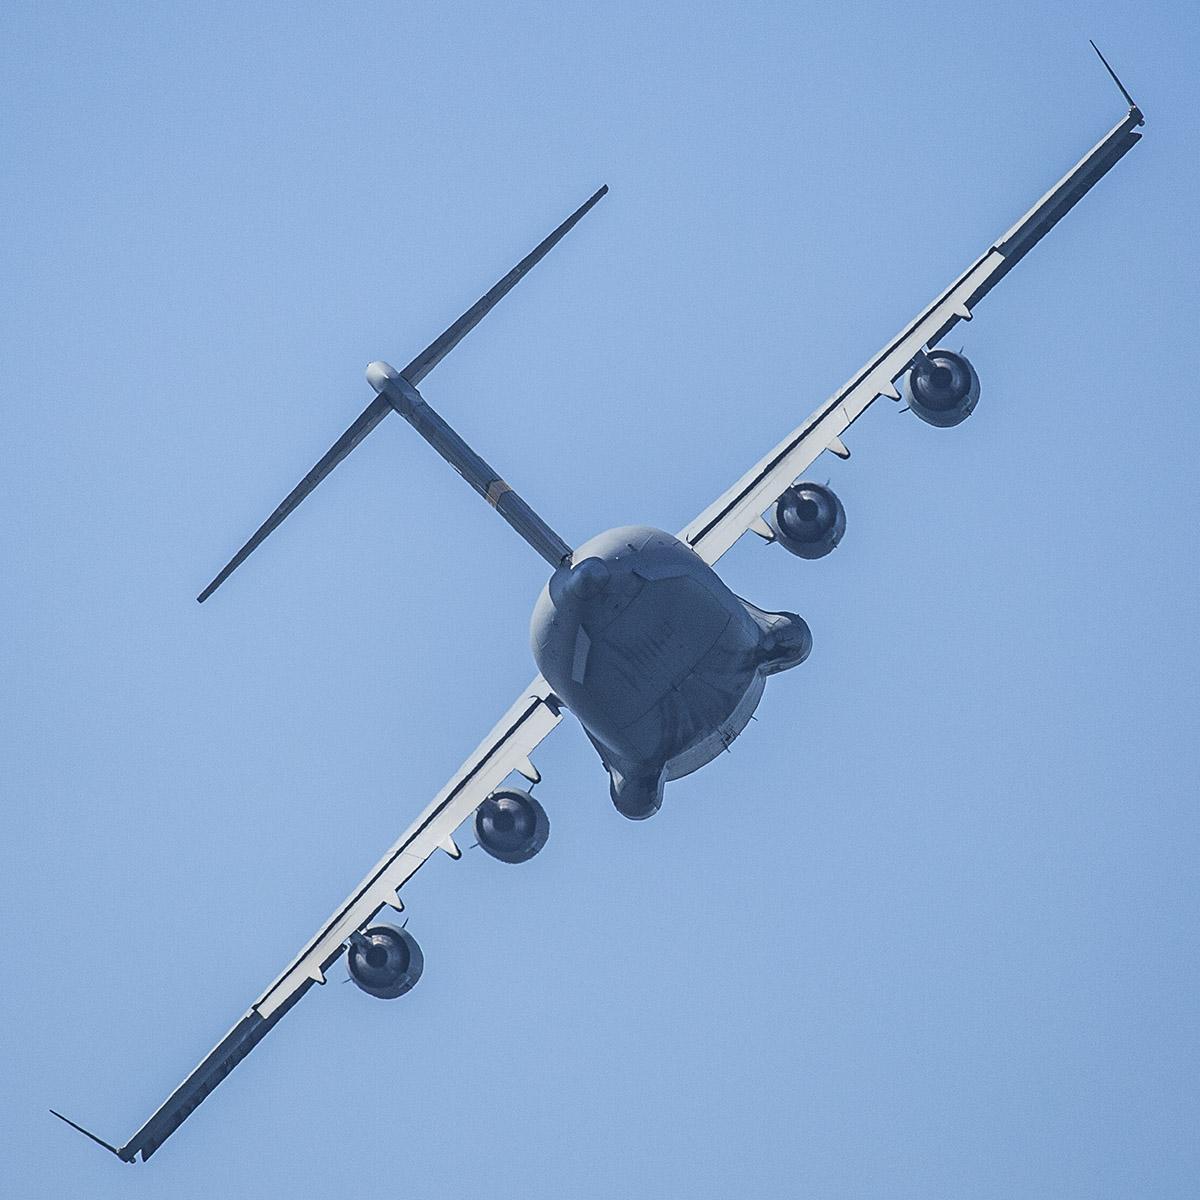 USAF Boeing C-17A Globemaster III